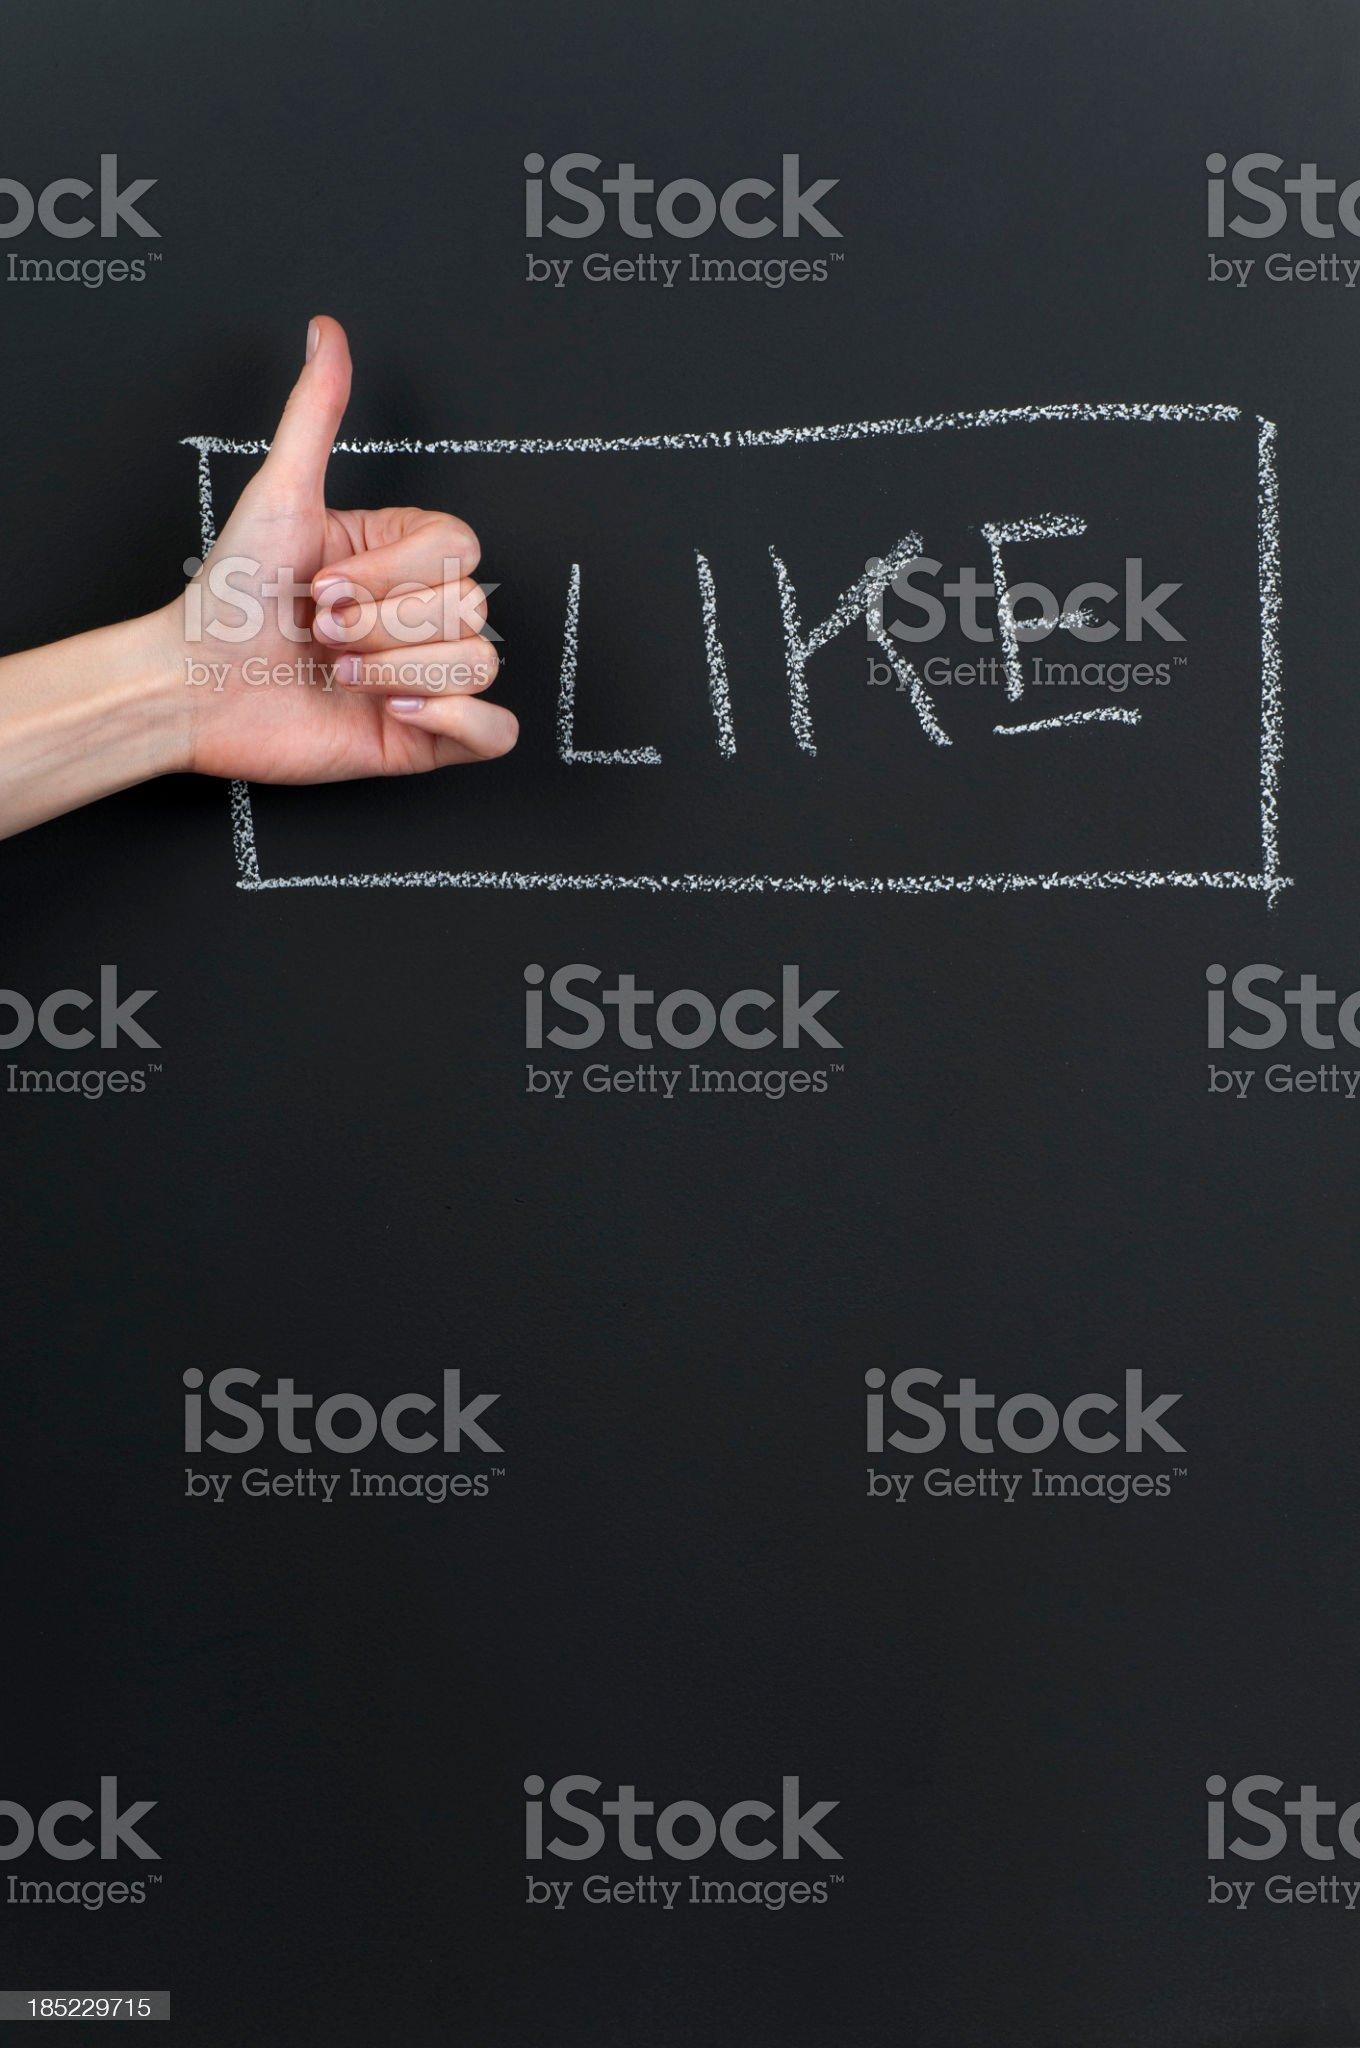 Like royalty-free stock photo